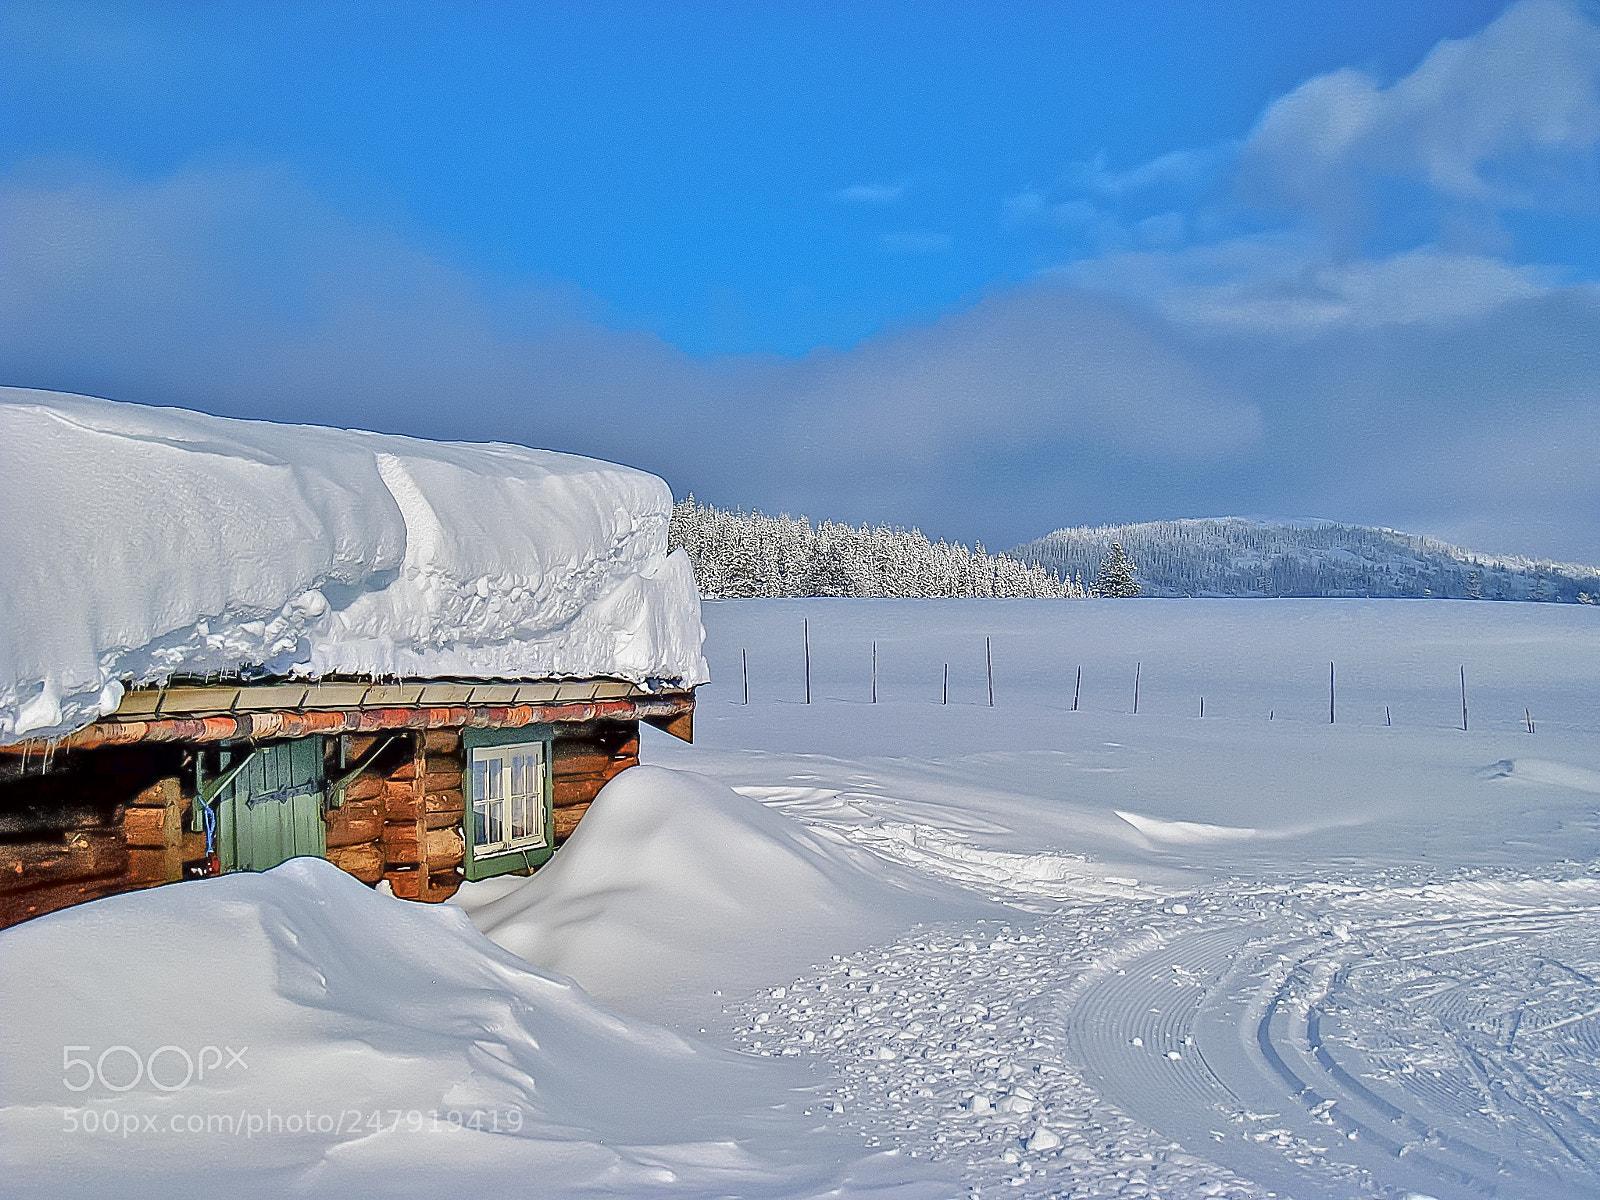 A winter remake, Canon DIGITAL IXUS 860 IS